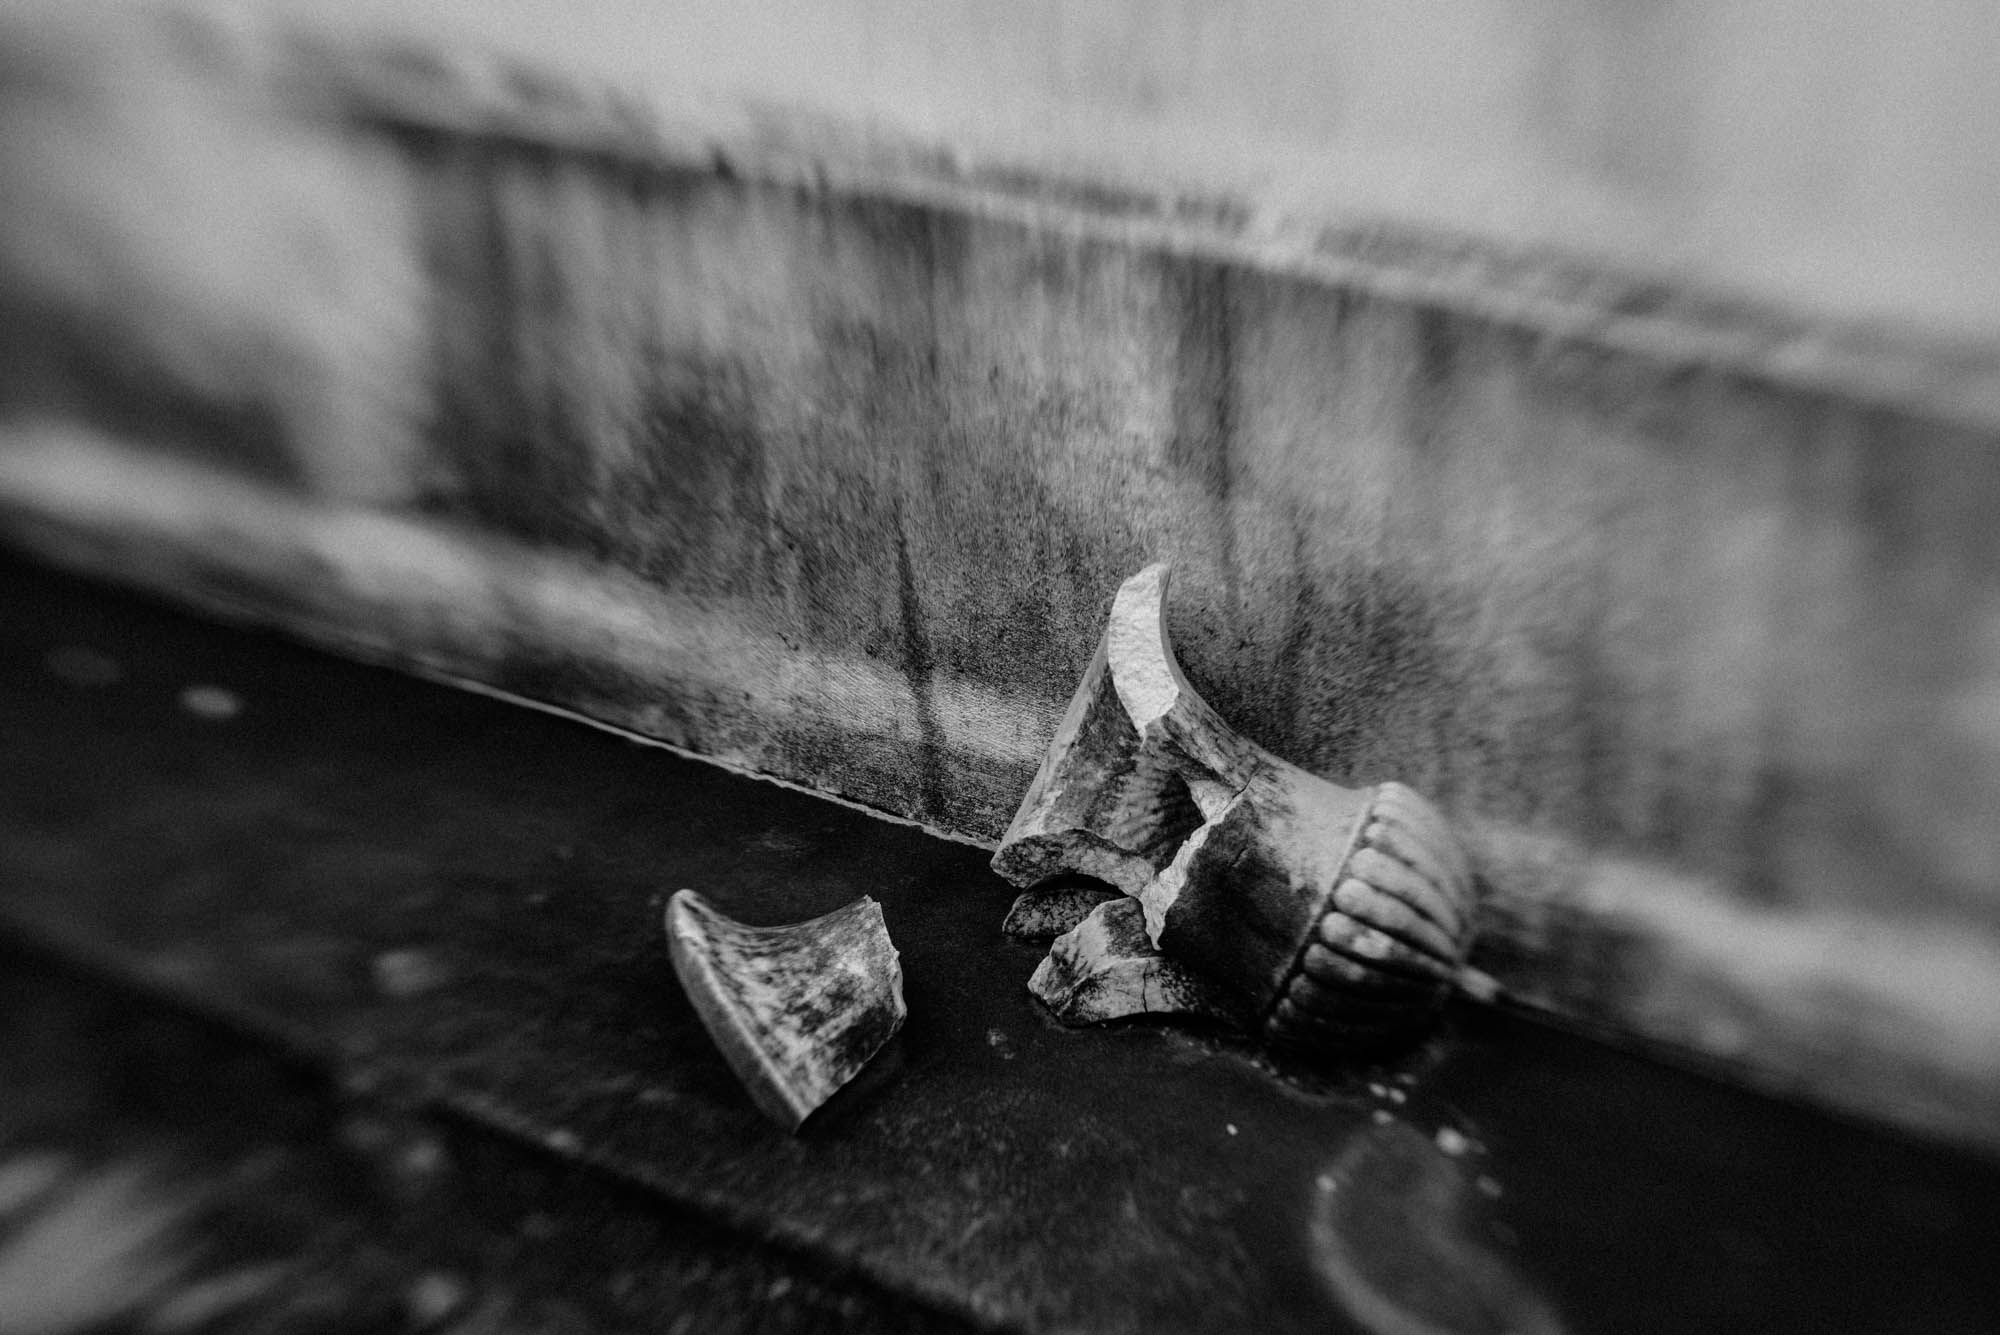 Carlos_Detres_Photography_Brugal_ForWeb_20150314_0405.jpg